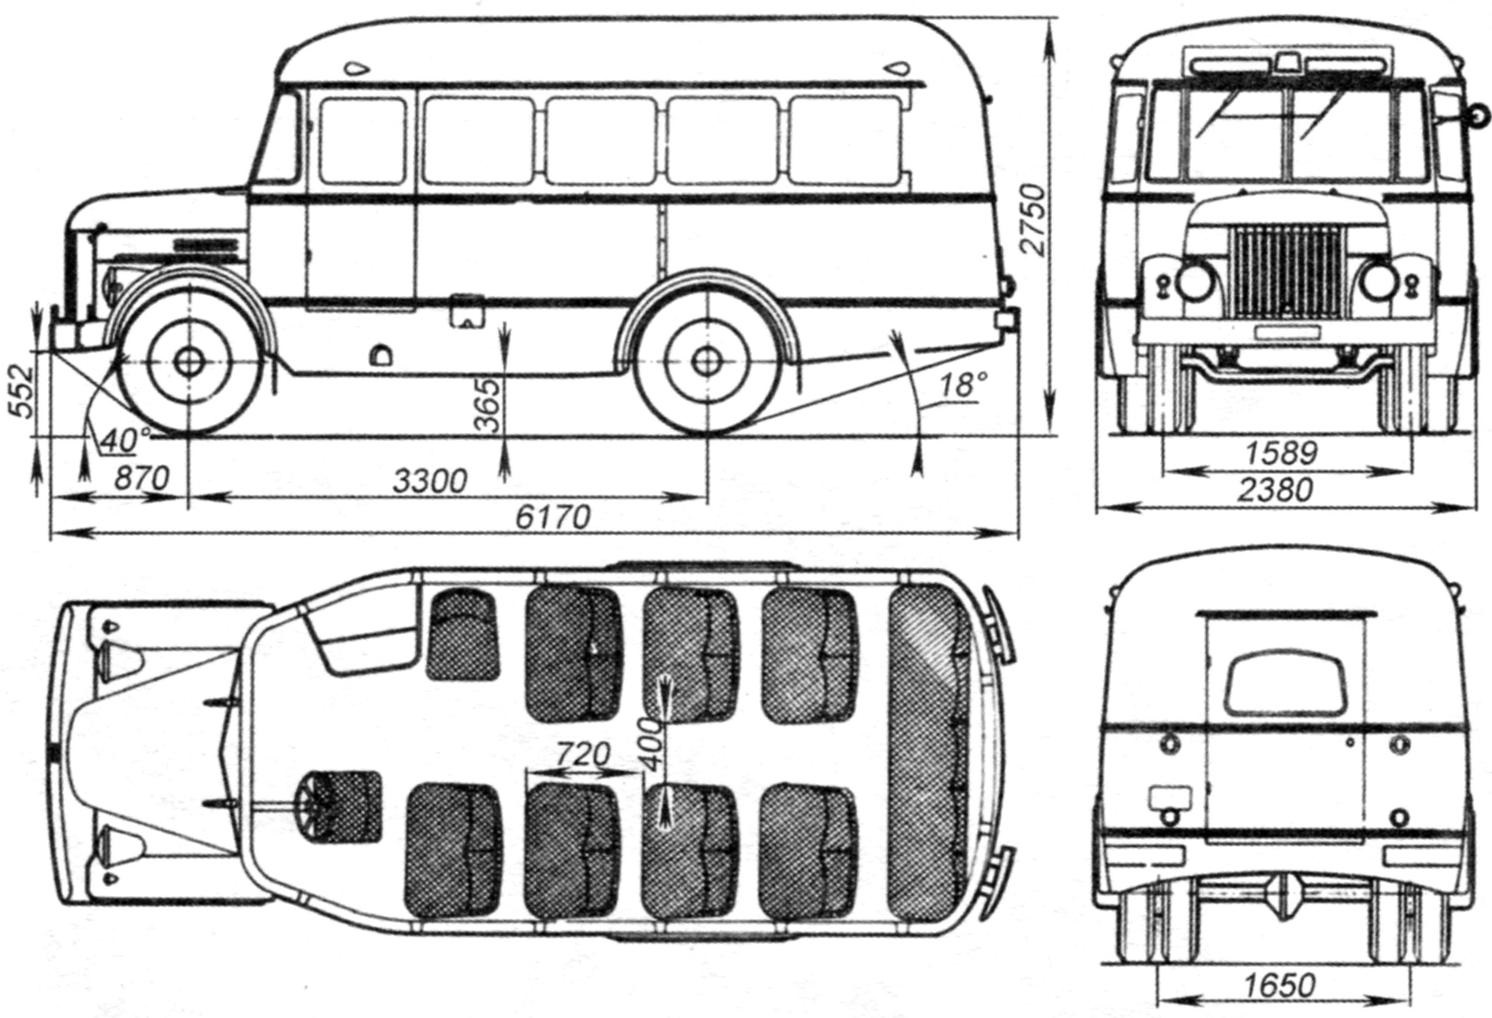 Bus GAZ-651